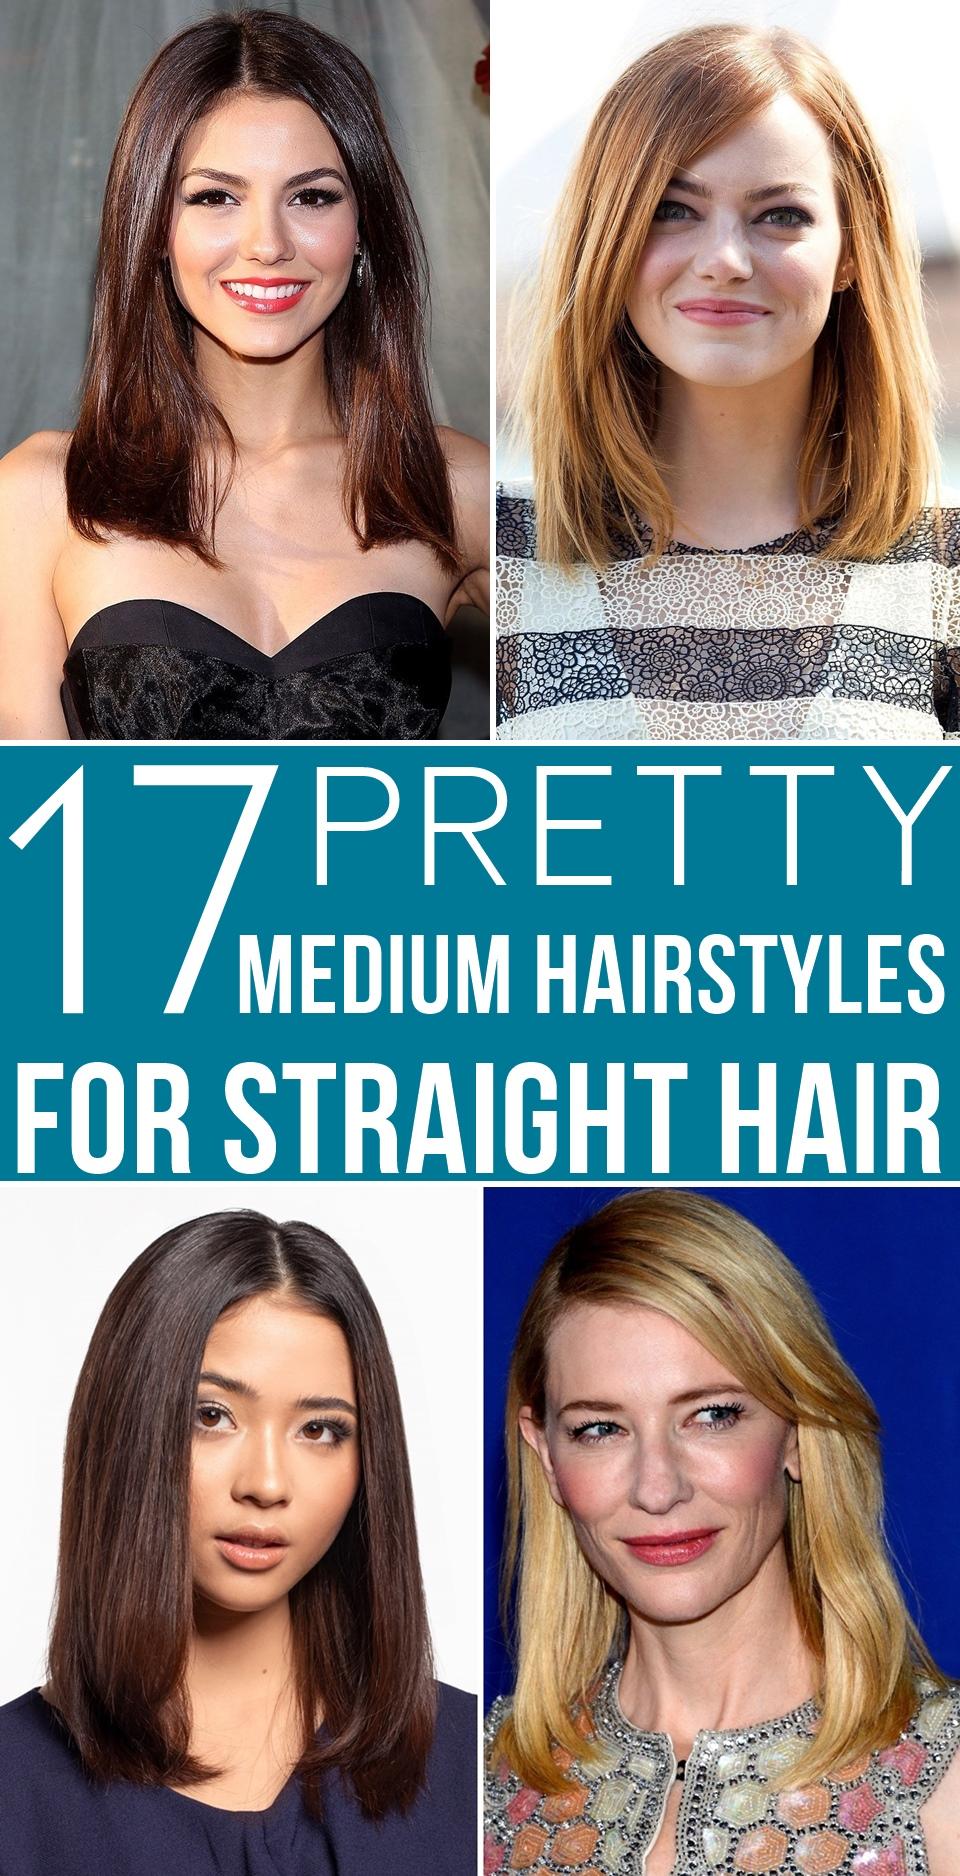 17 Pretty Medium Hairstyles For Straight Hair